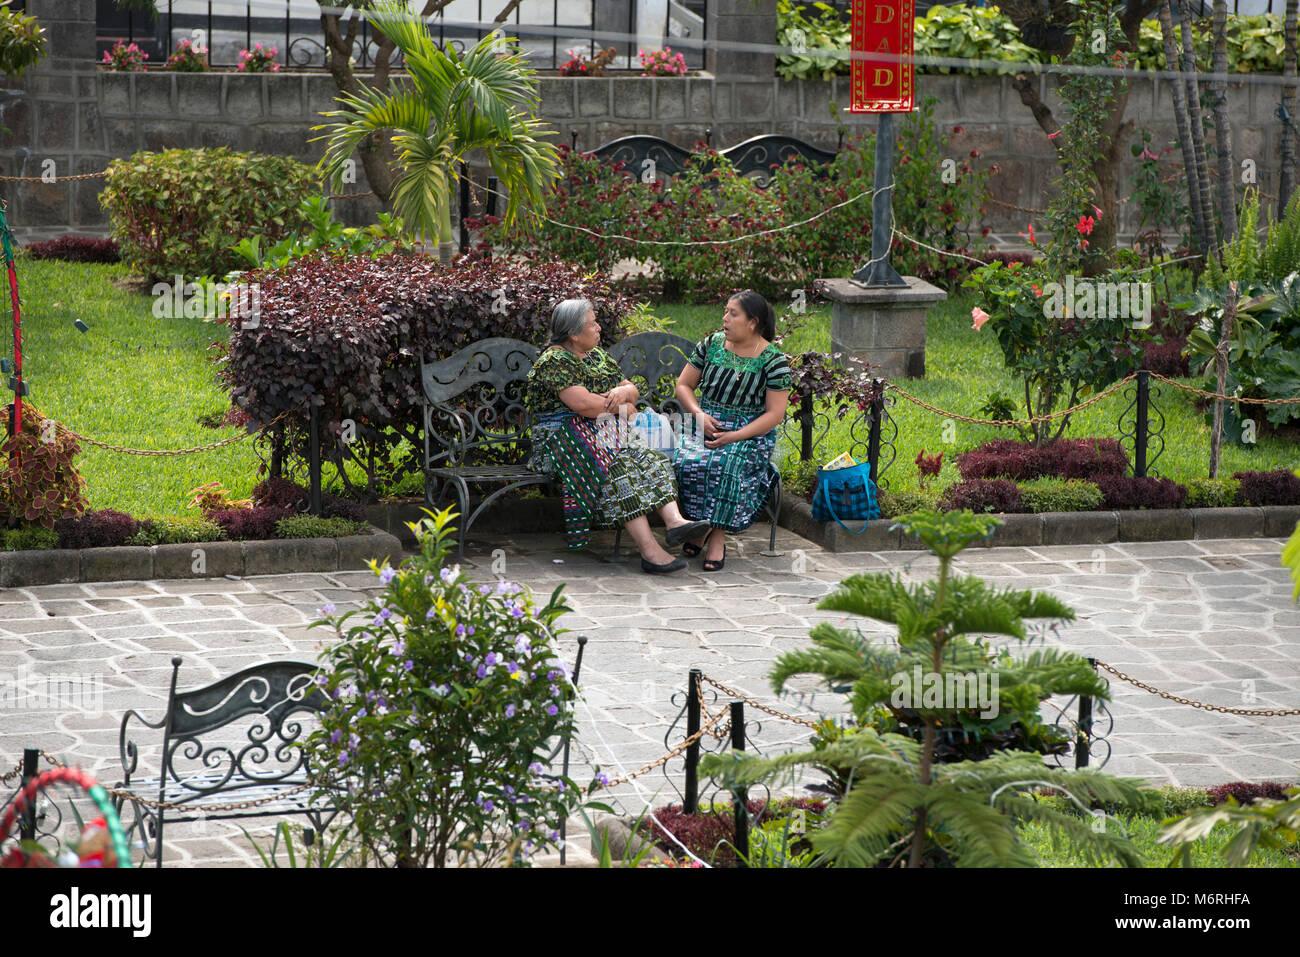 Two indigenous, ethnic Tz'utujil Maya women sitting on a park bench, talking in Santiago de Atitlán, Sololá - Stock Image